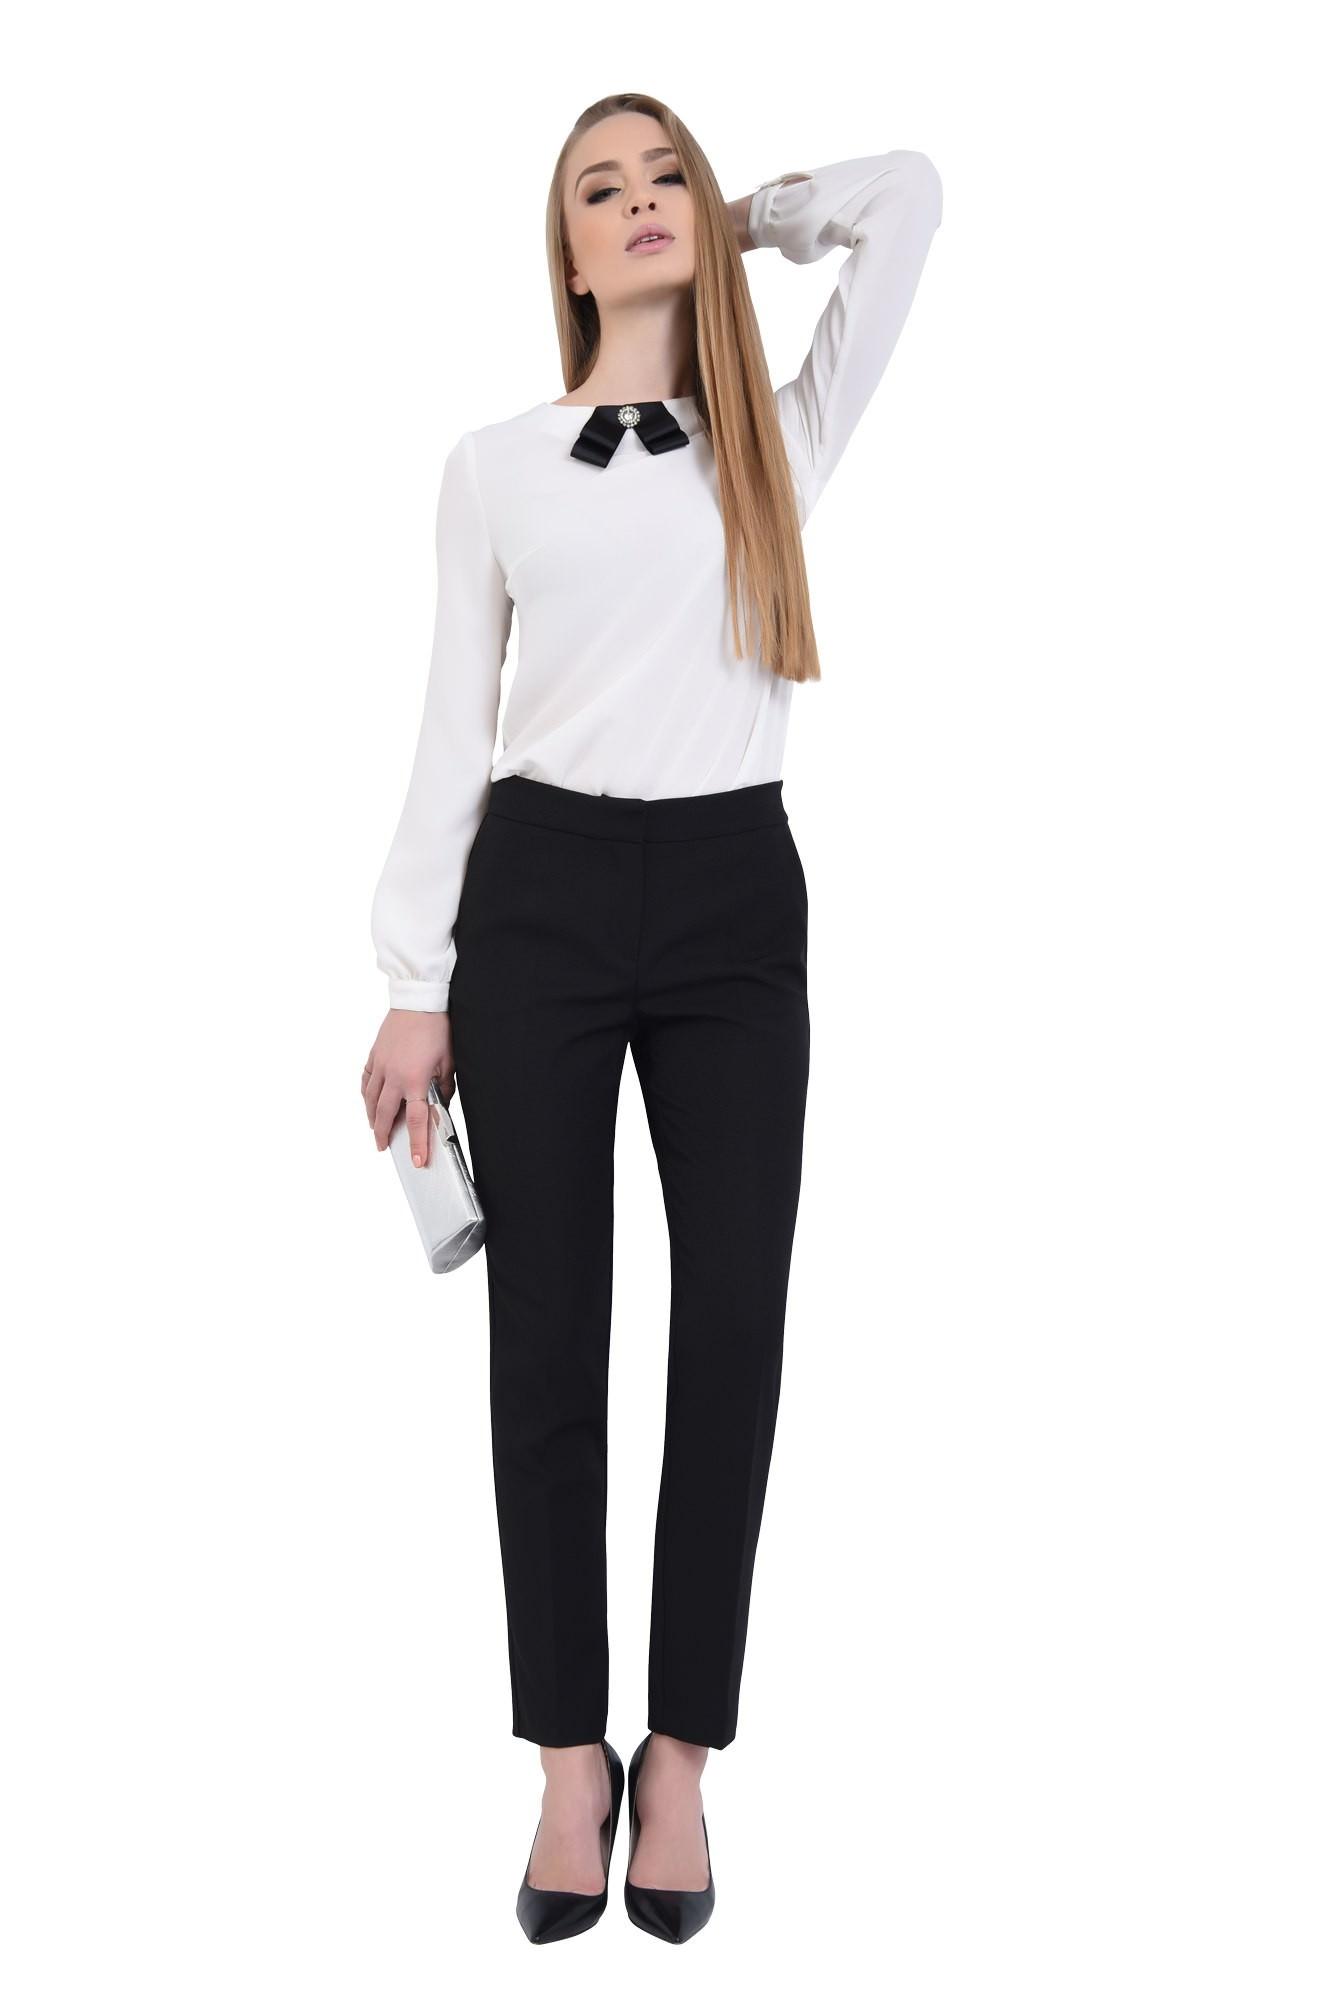 360 - Pantaloni pana, de birou, lungi, croi tigareta